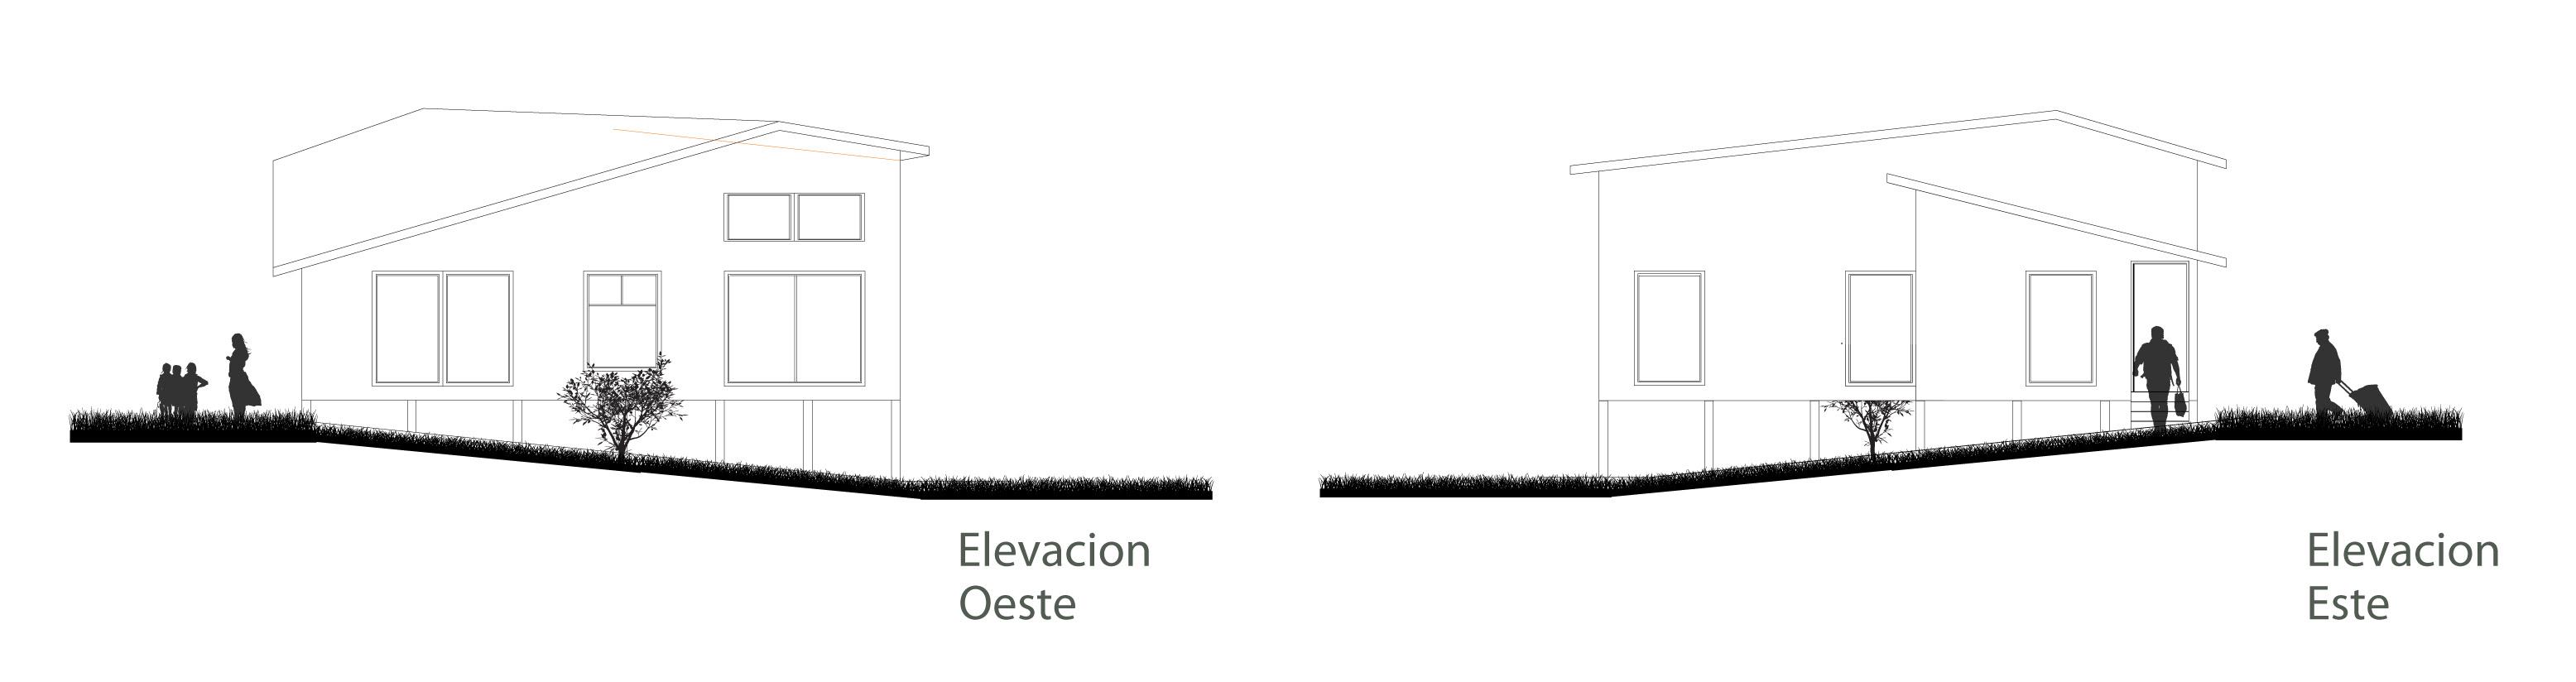 Casa Habitación Rural, Studio Fernanda Vuilleumier, arquitectura, casas